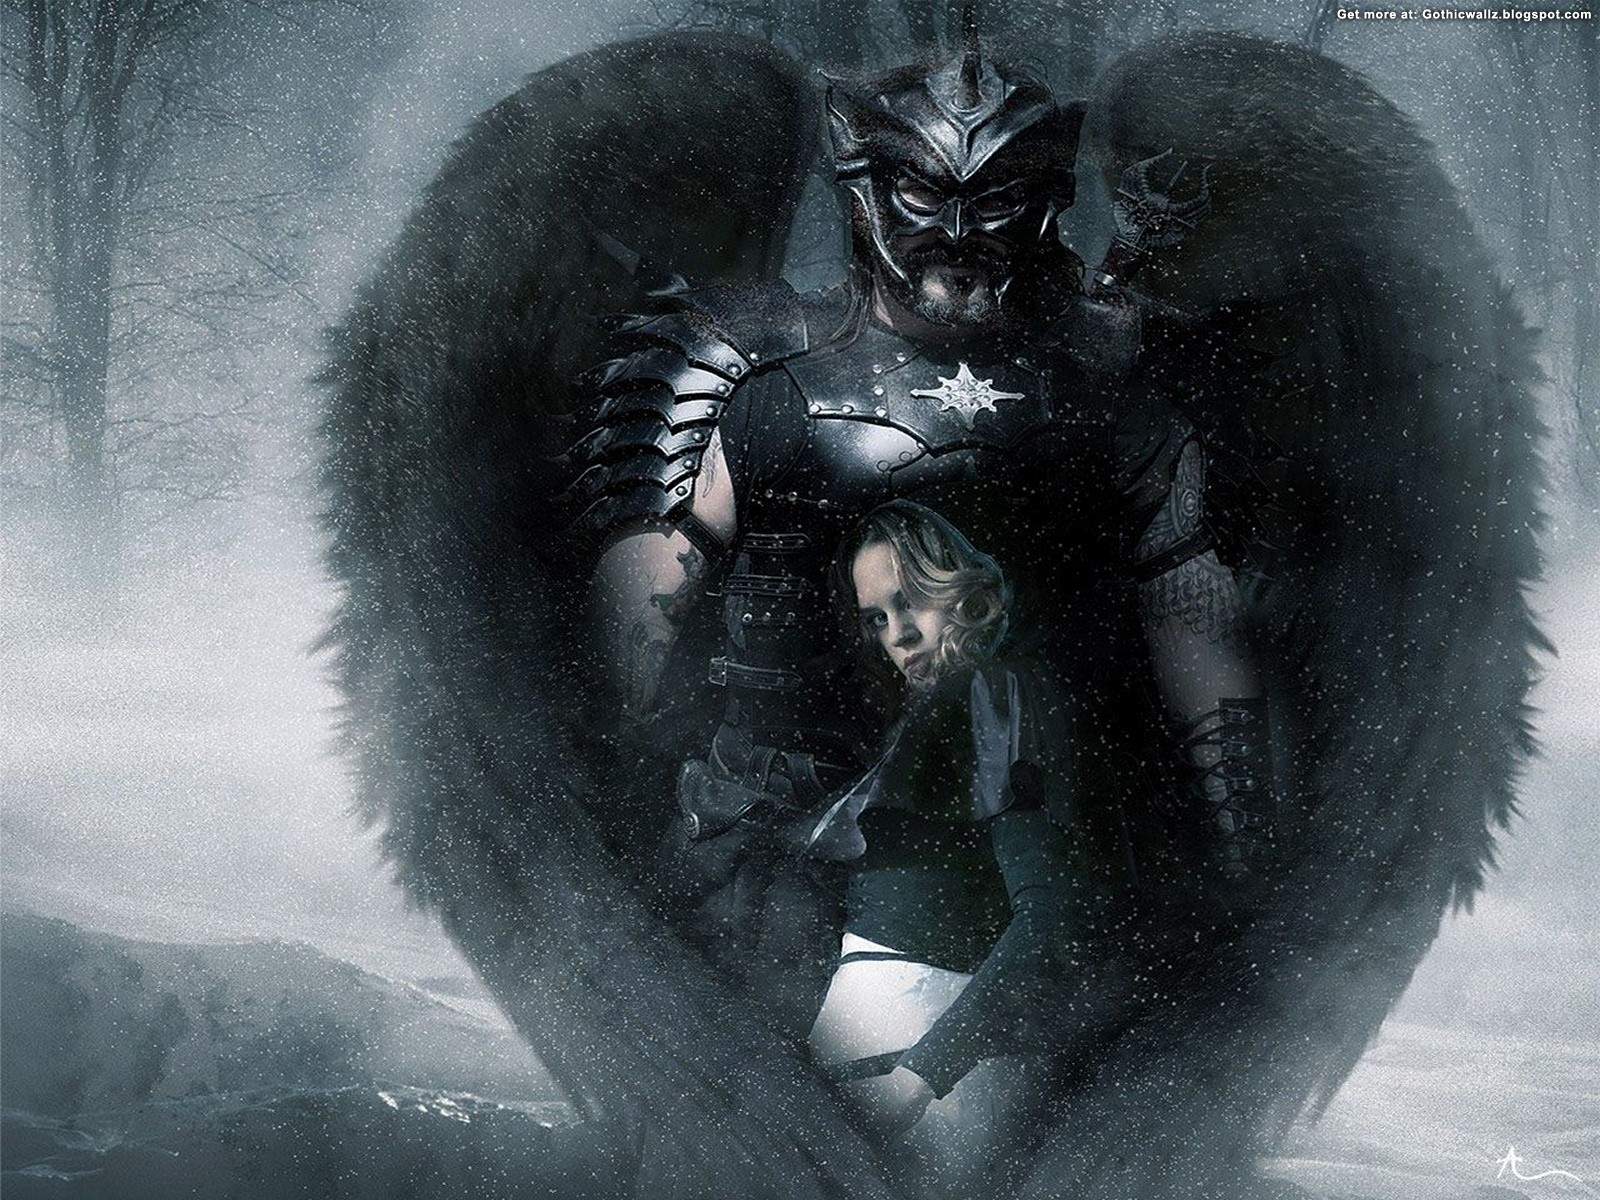 Dark Angel With Girl - Dark Guardian Angel Art - HD Wallpaper